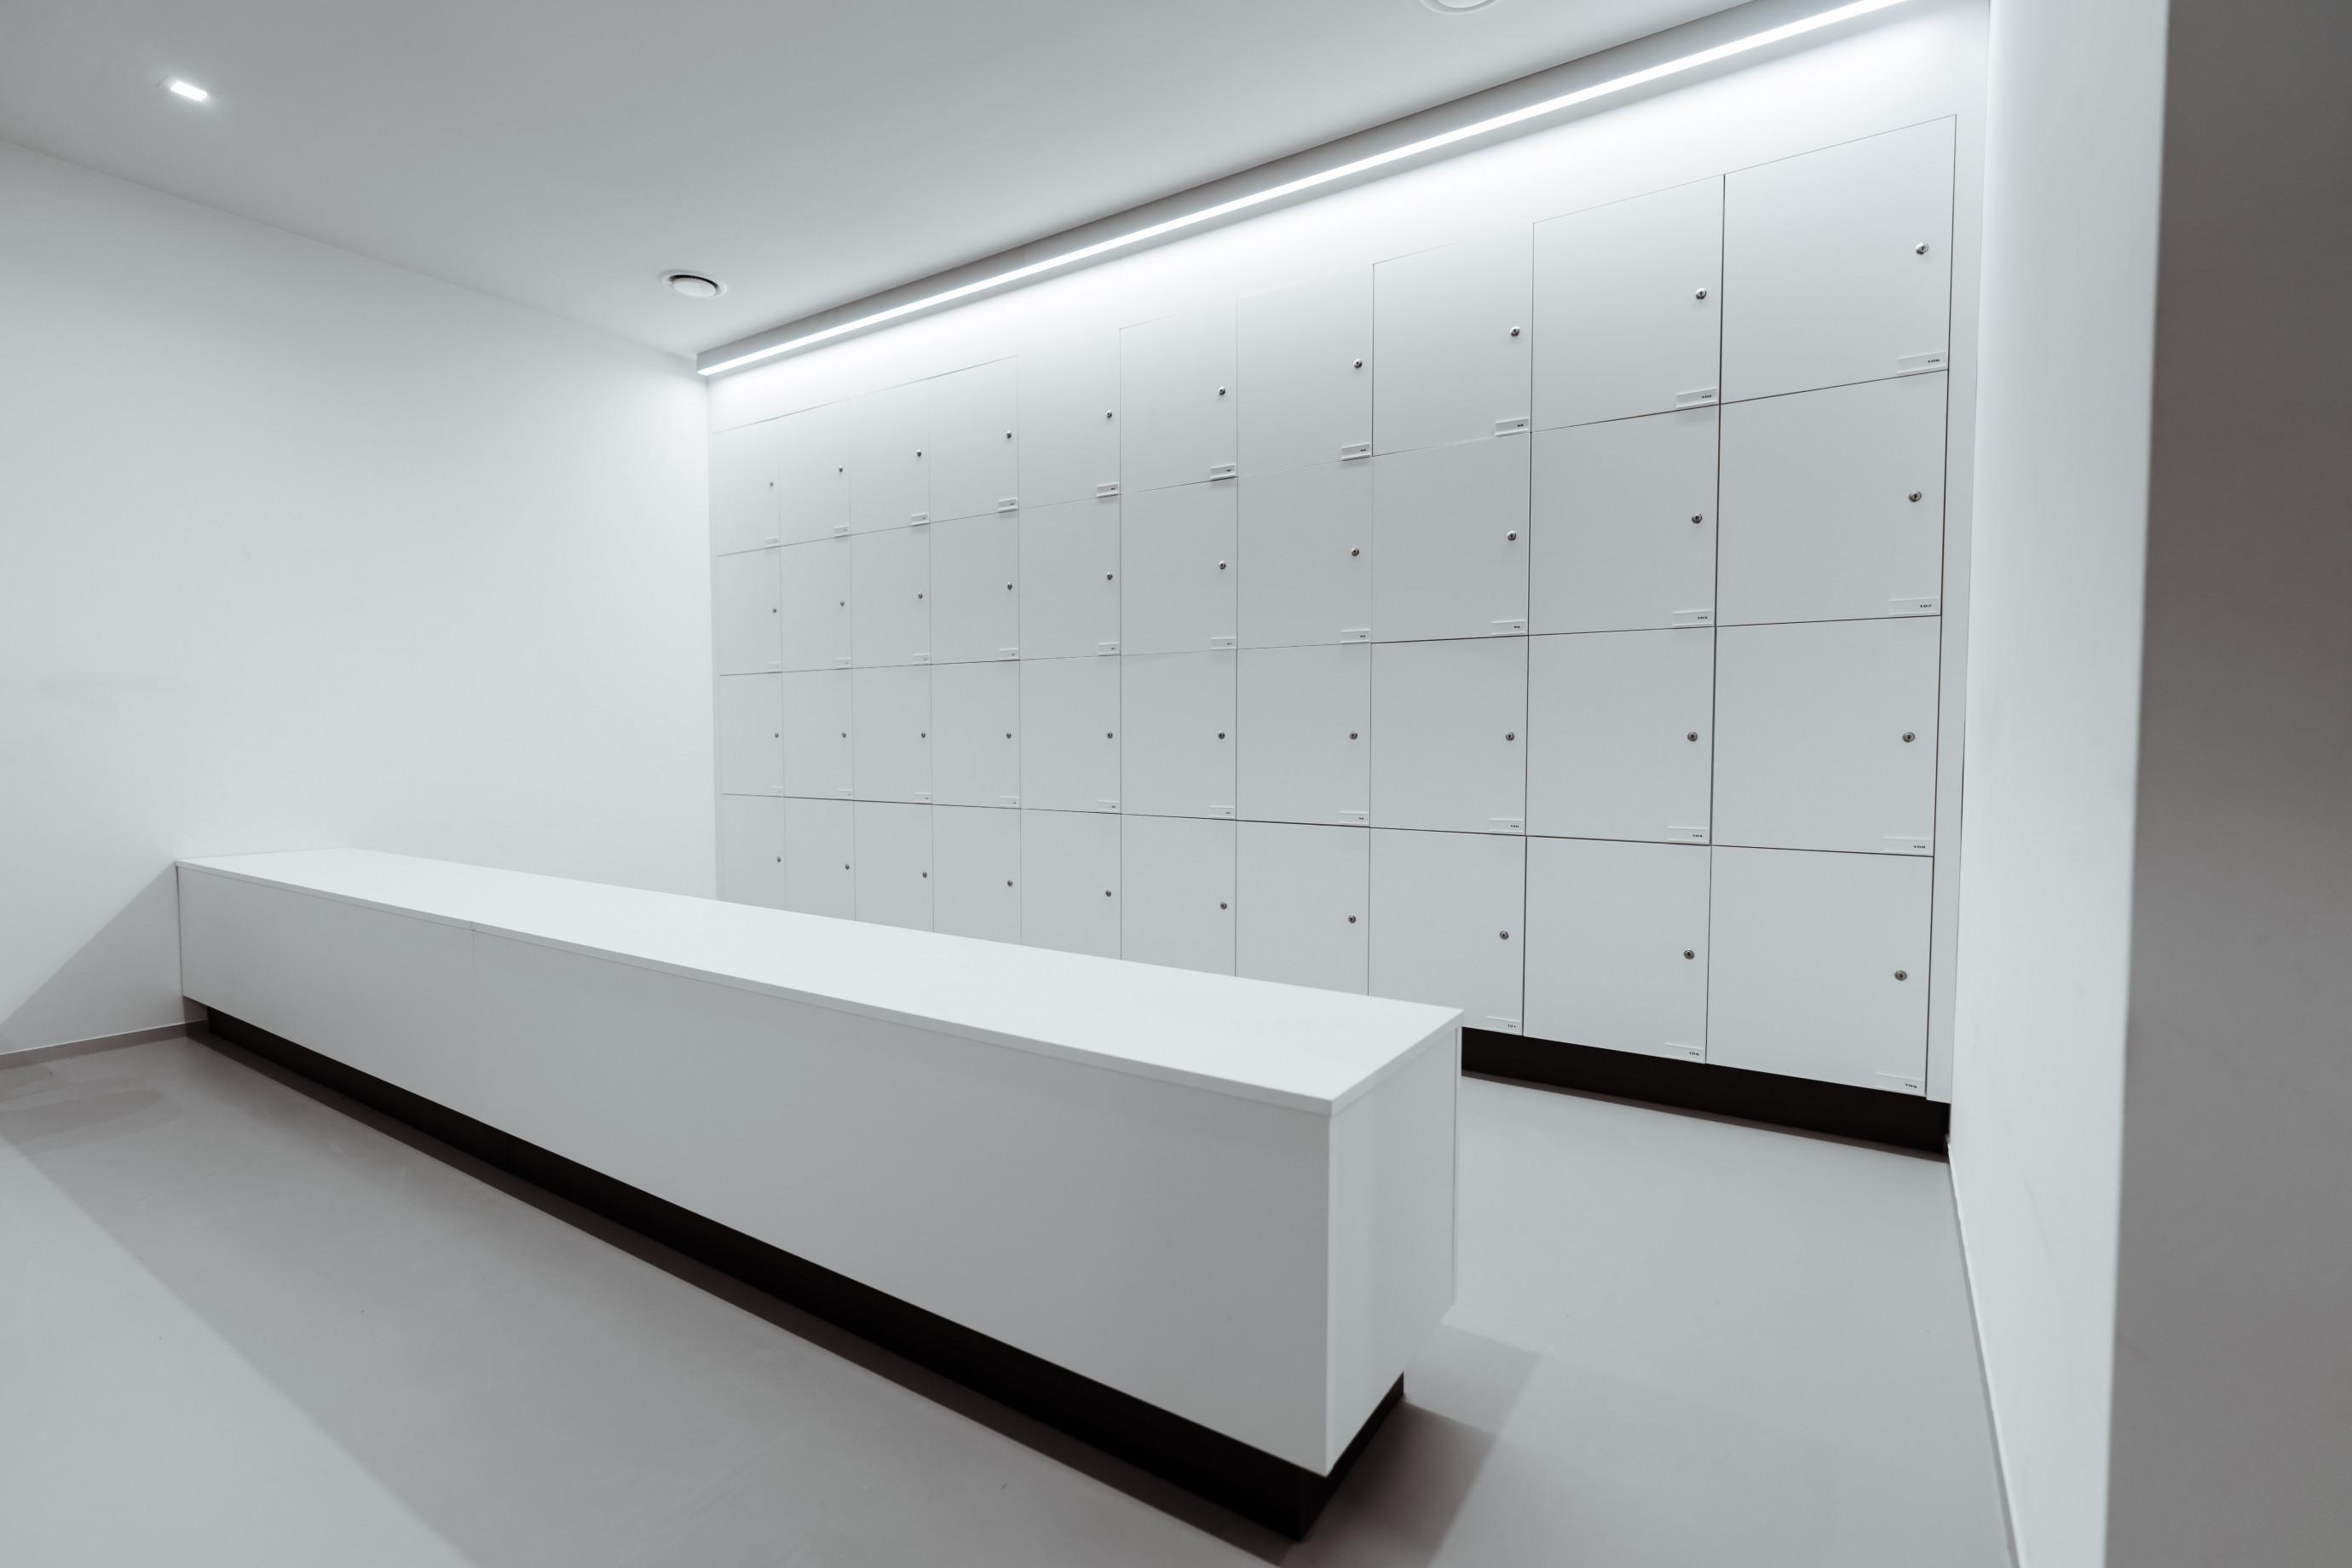 Lab furniture: lockers